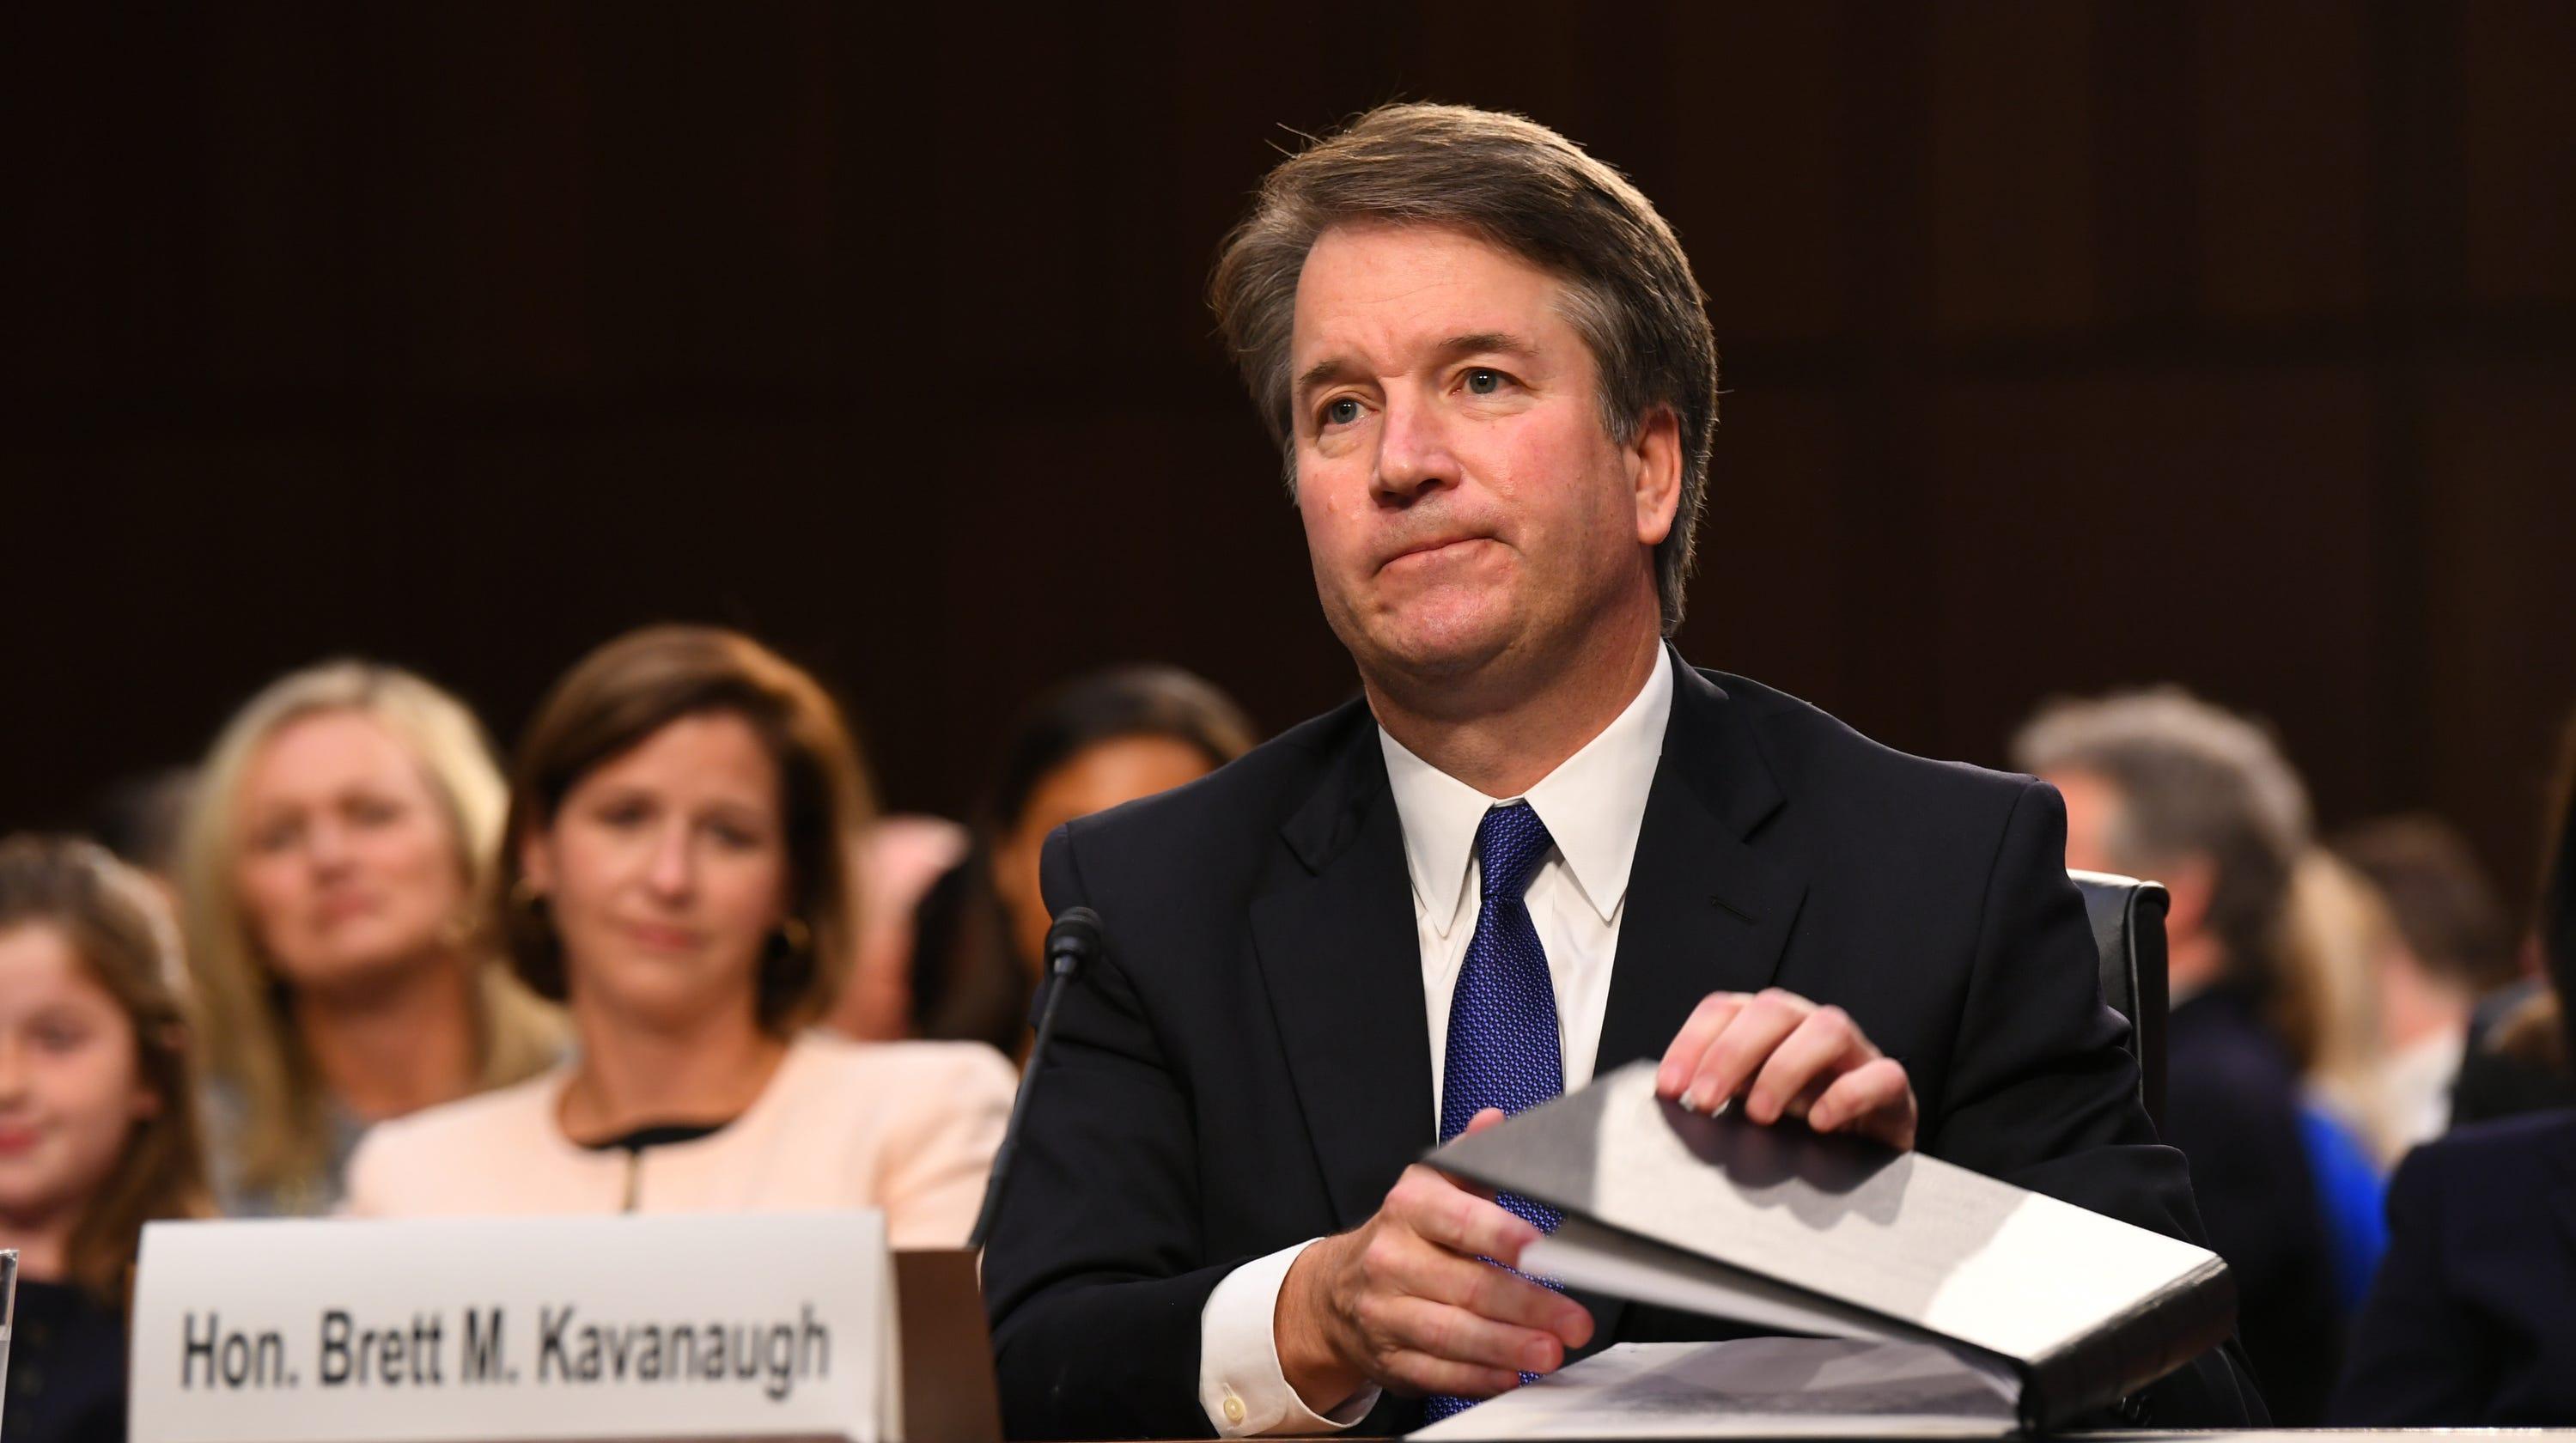 Republicans, Democrats face risks and rewards in Brett Kavanaugh's embattled  Supreme Court nomination